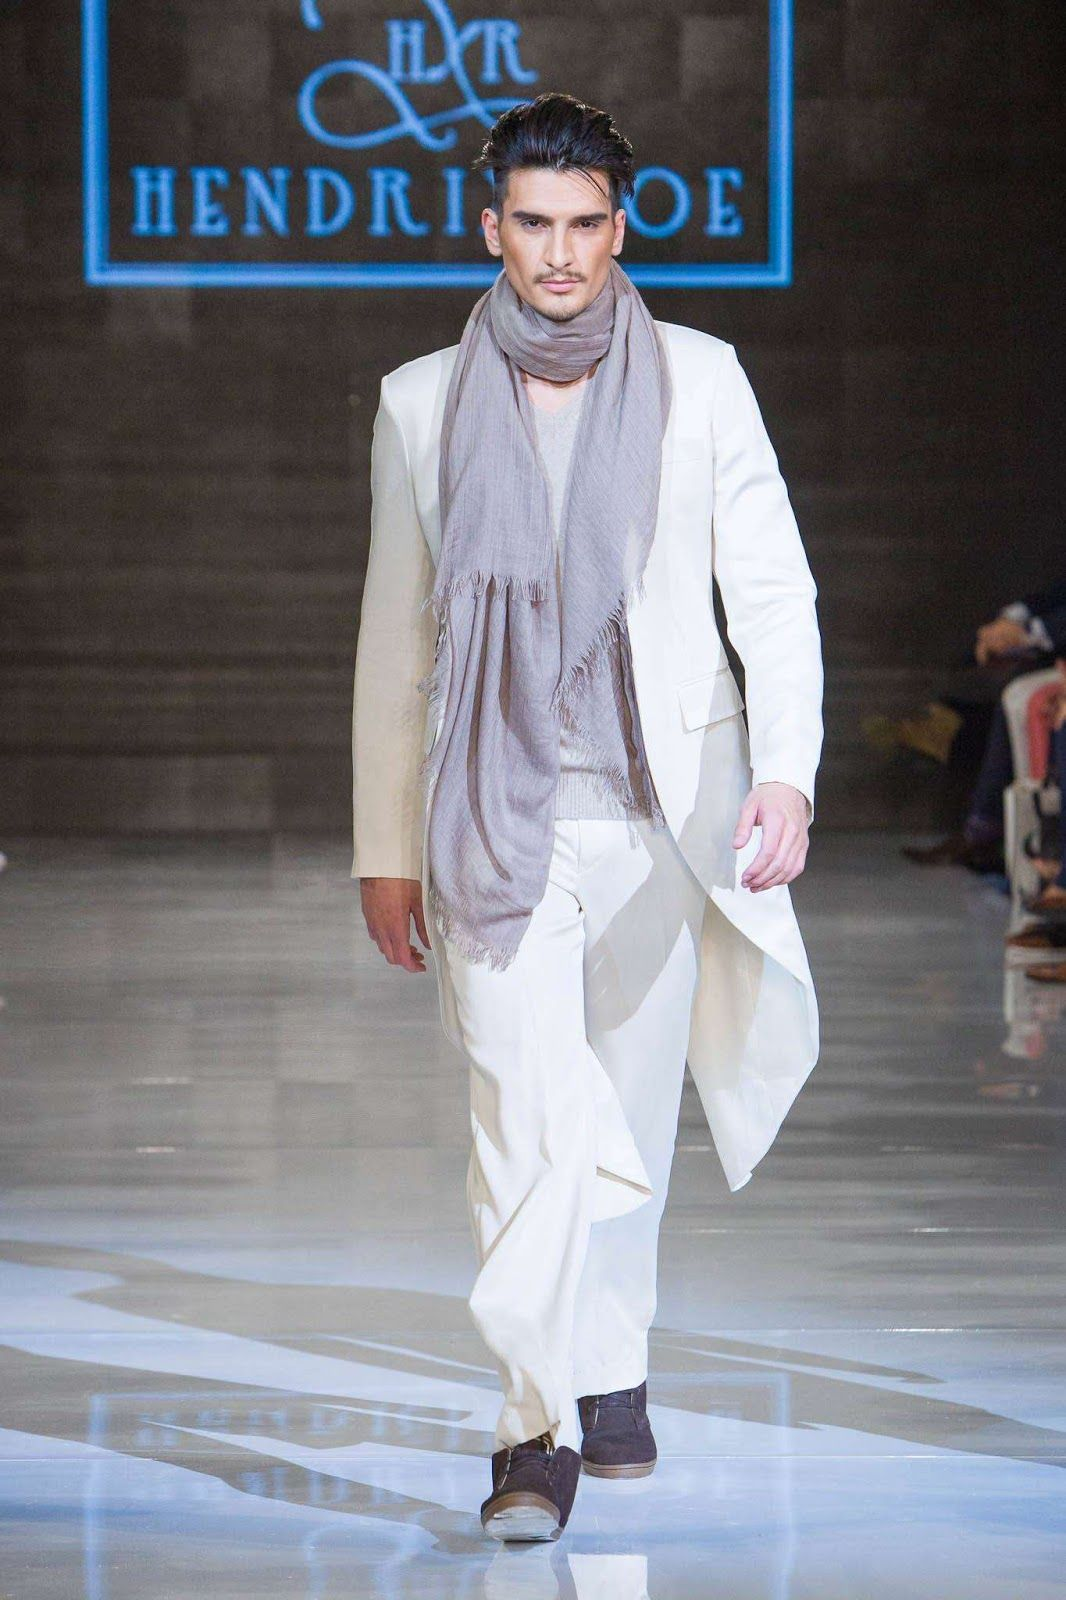 HENDRIXROE Spring-Summer 2017 - Toronto Men's Fashion Week #TOMSS17